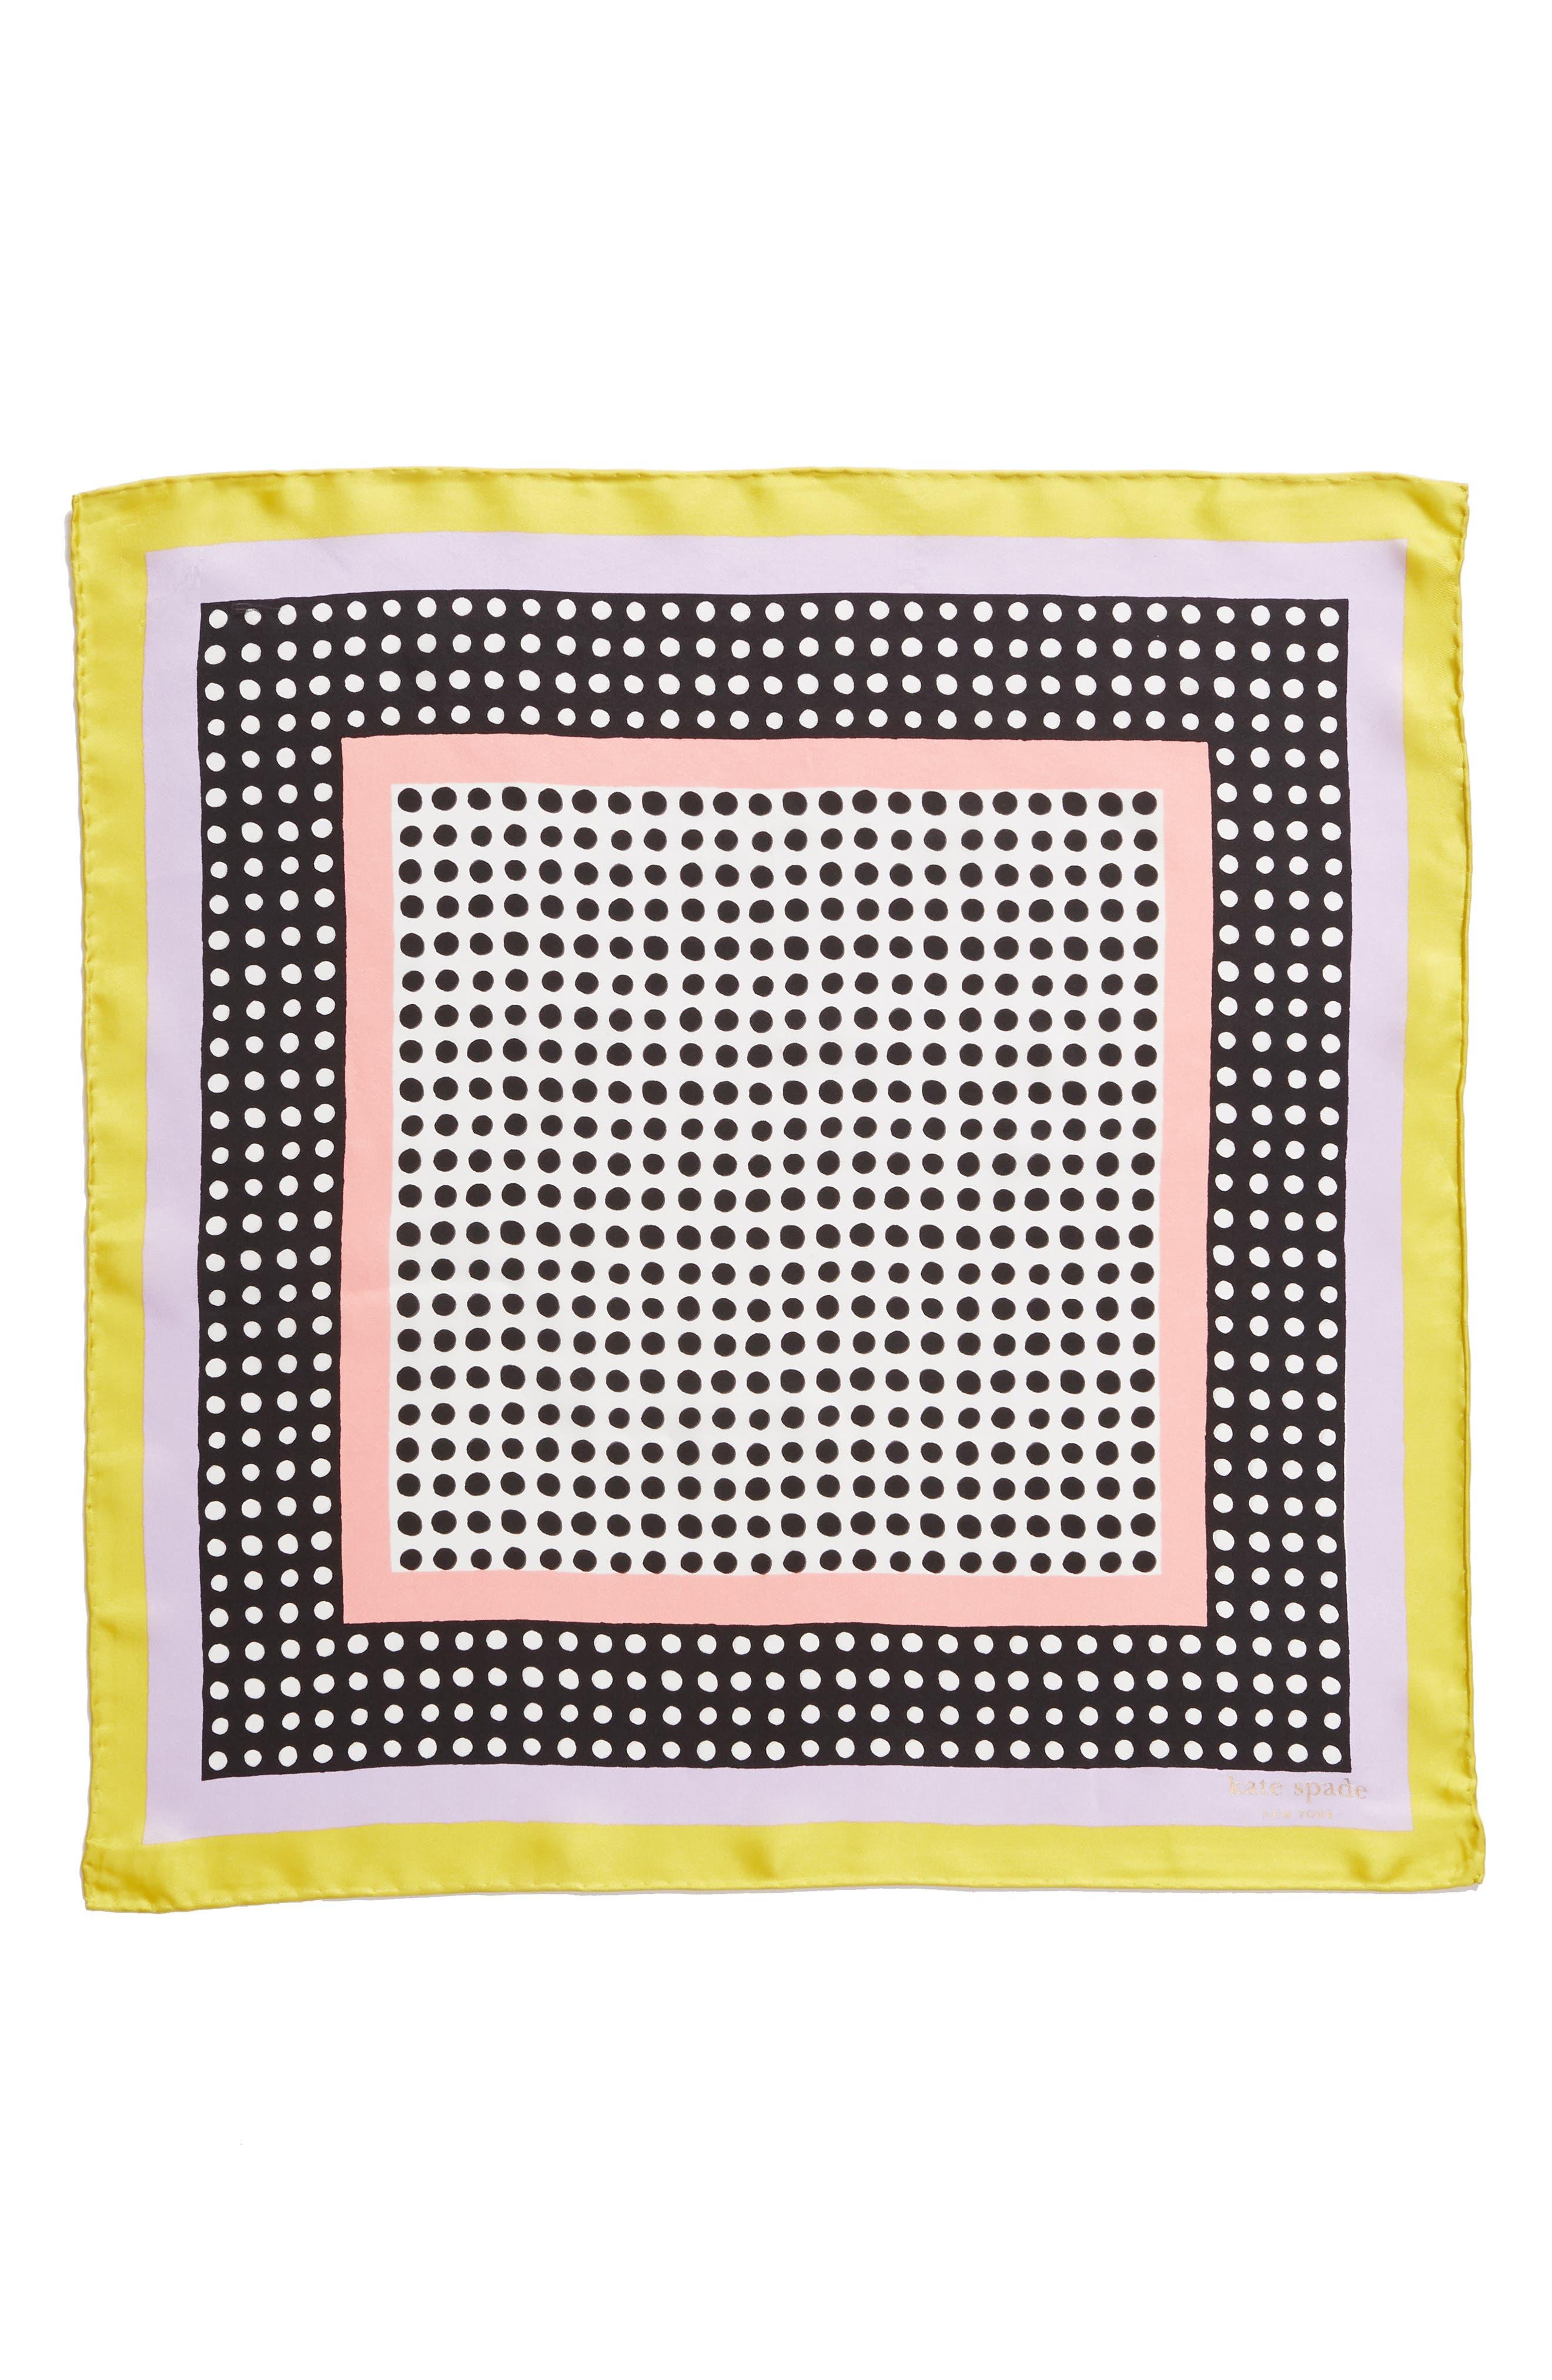 KATE SPADE NEW YORK,                             dotty silk bandana,                             Alternate thumbnail 3, color,                             CHARTREUSE